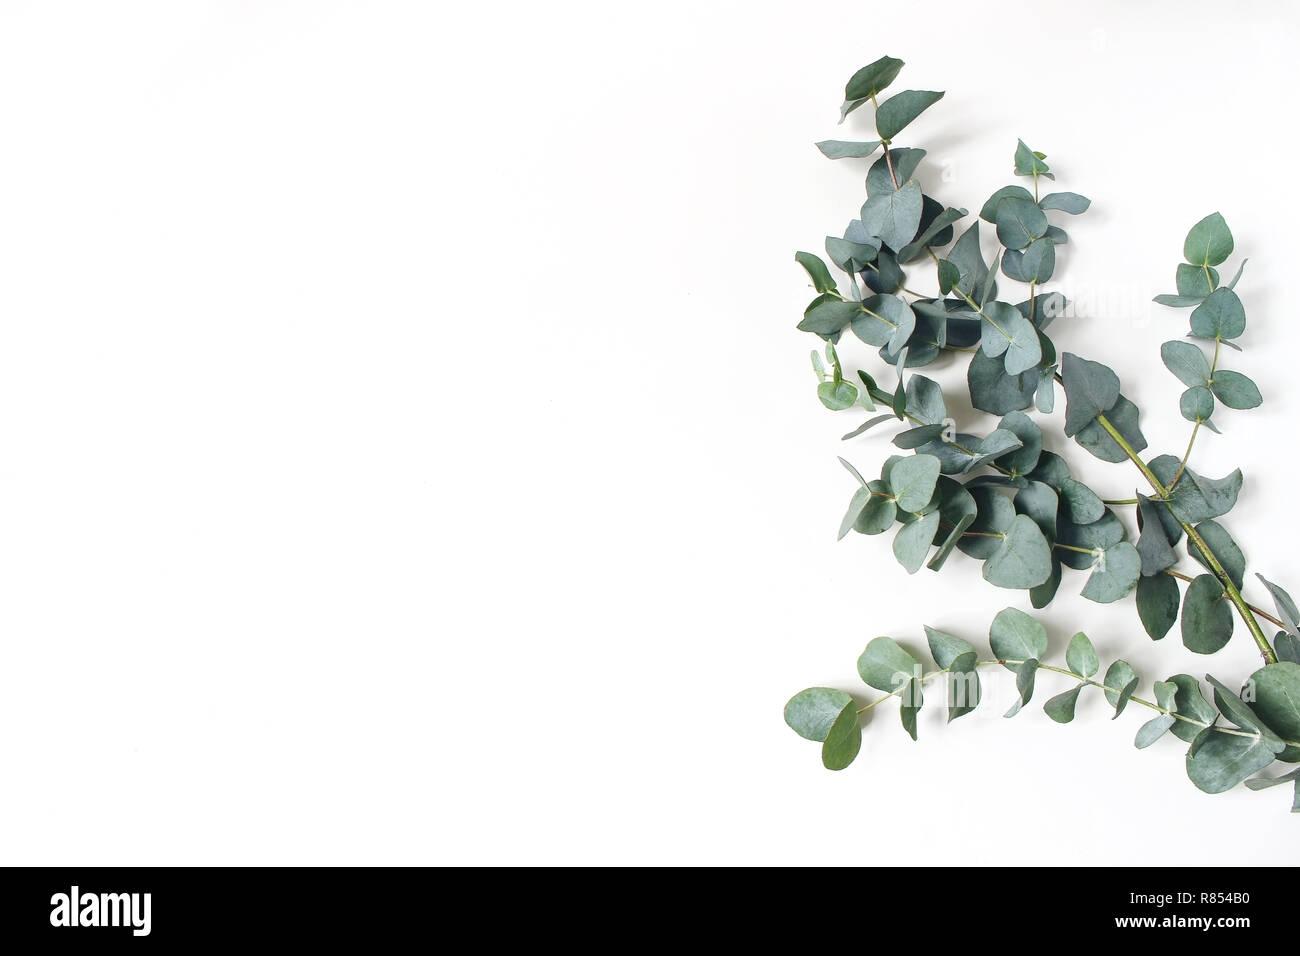 angle de trame, faite de feuilles et de branches d'eucalyptus vert